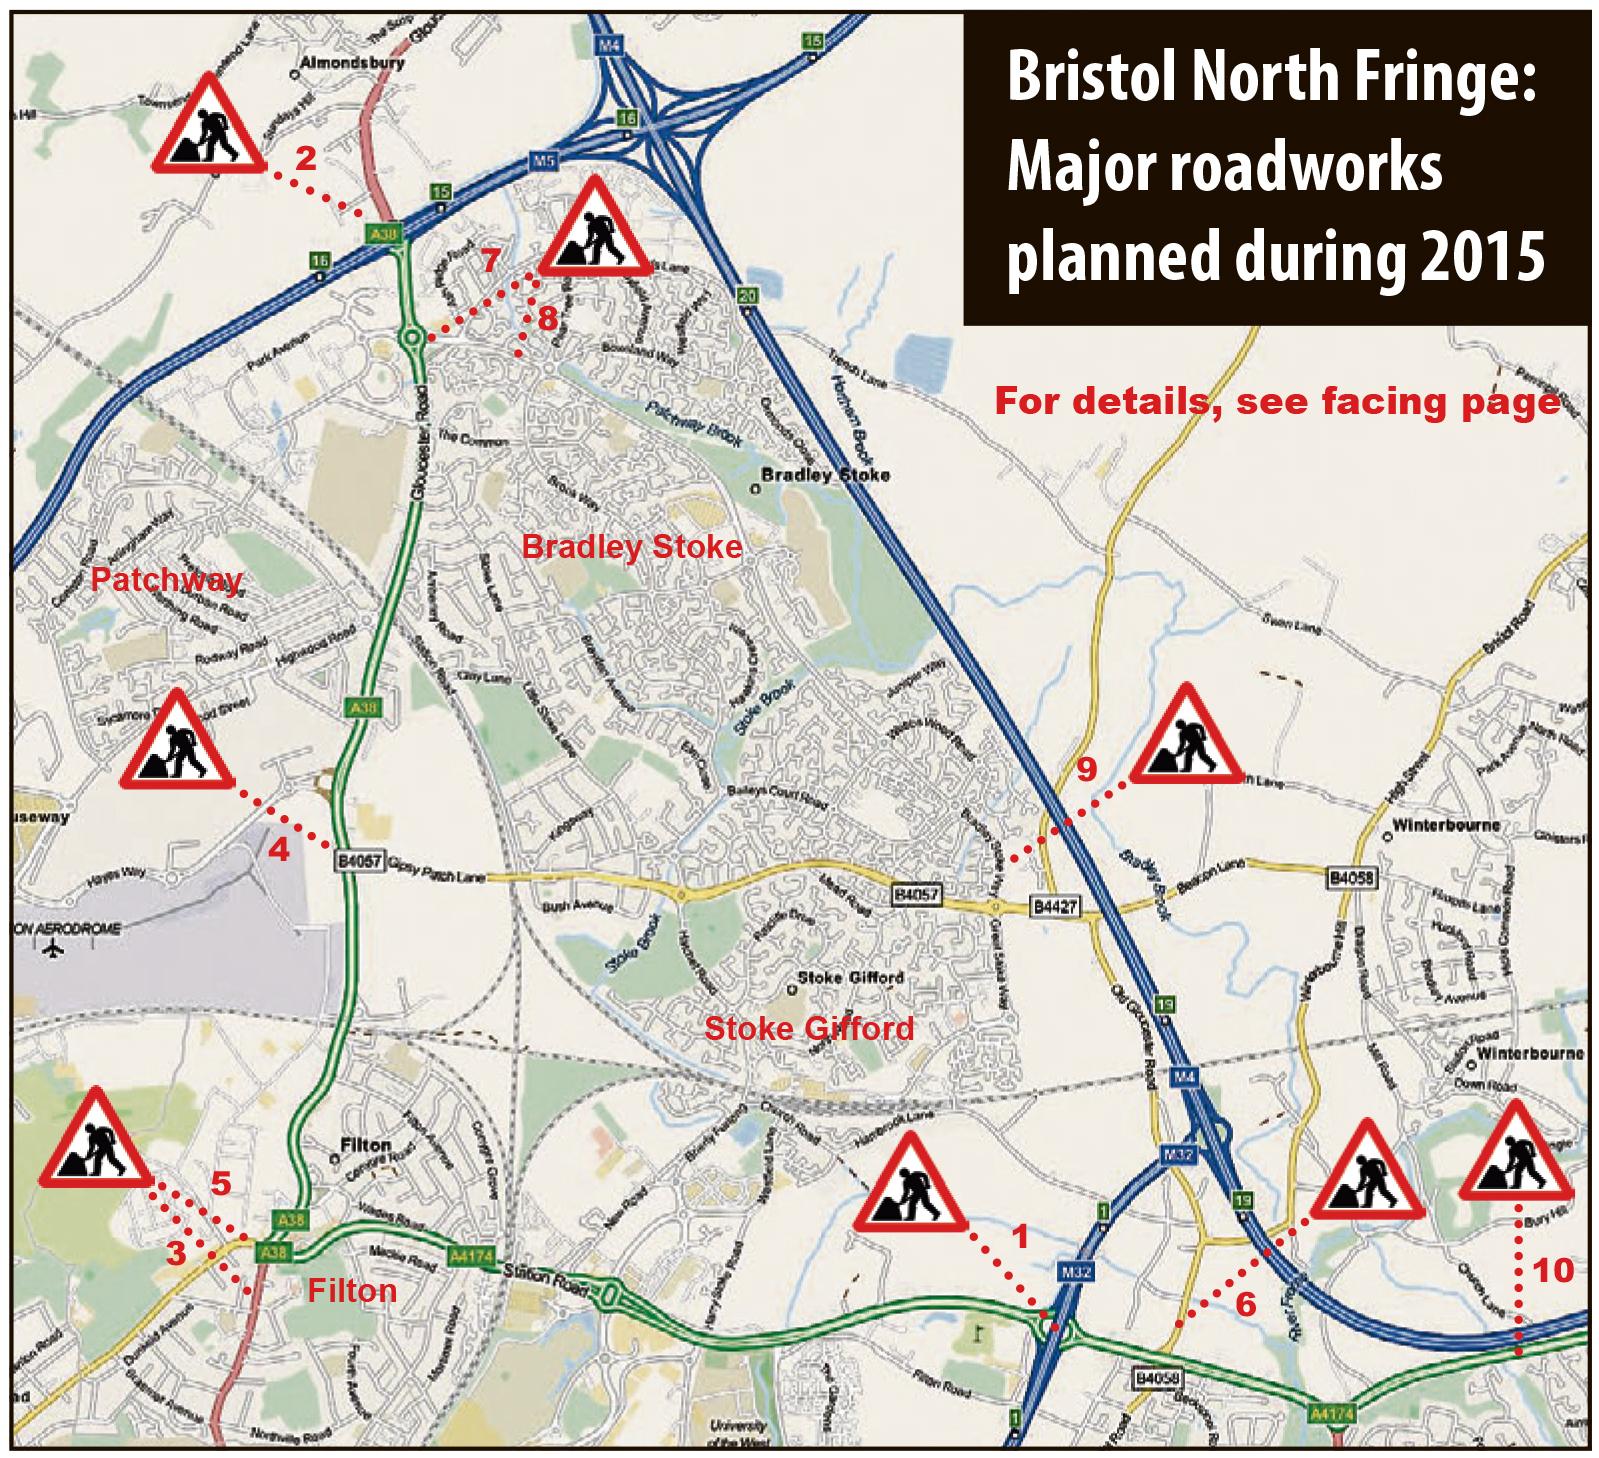 Bristol North Fringe Roadworks in 2015.